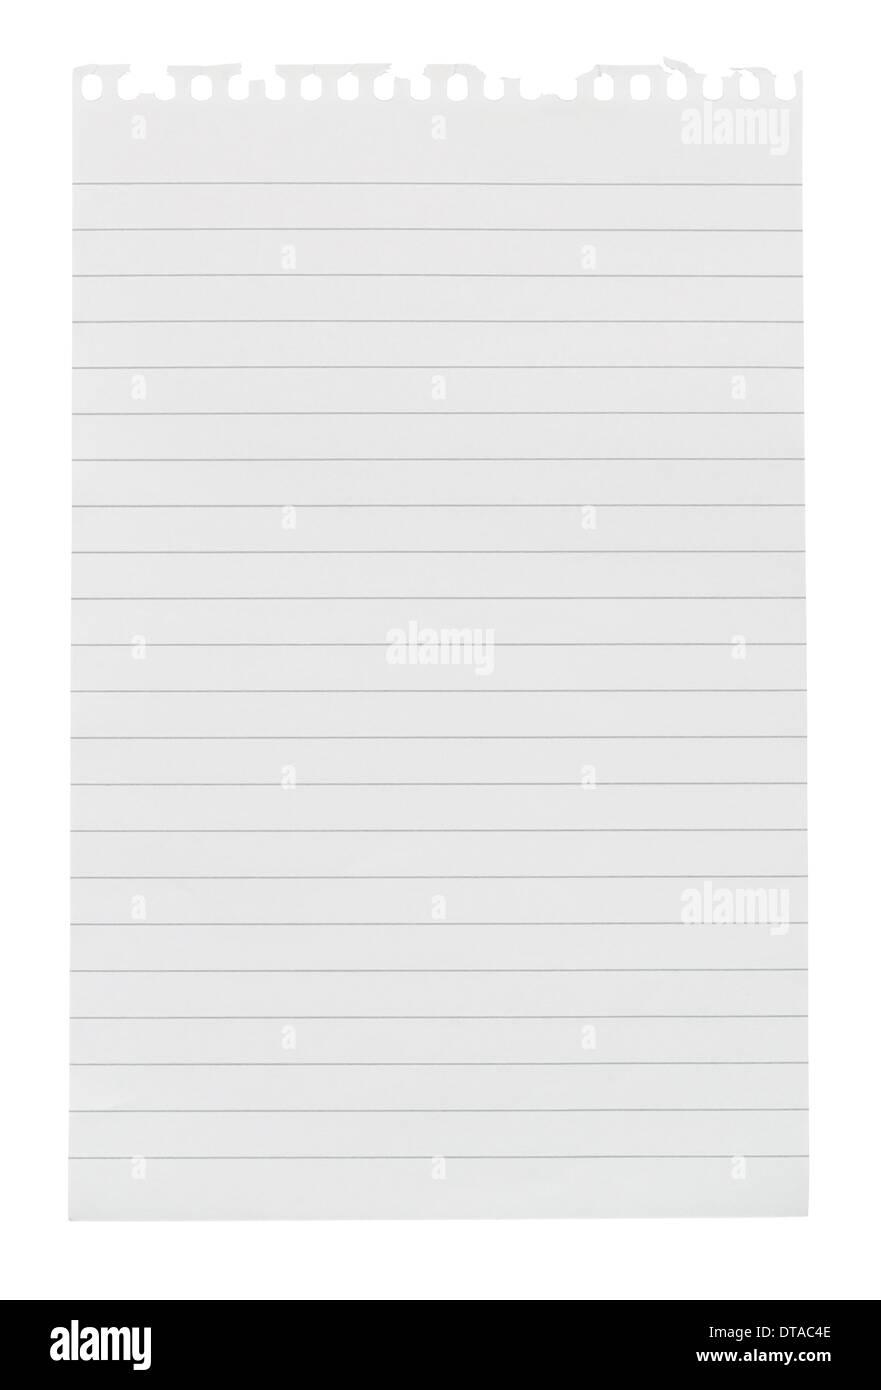 Nota de papel revestido de hoja arrancada de un bloc de notas aisladas contra un fondo blanco. Imagen De Stock